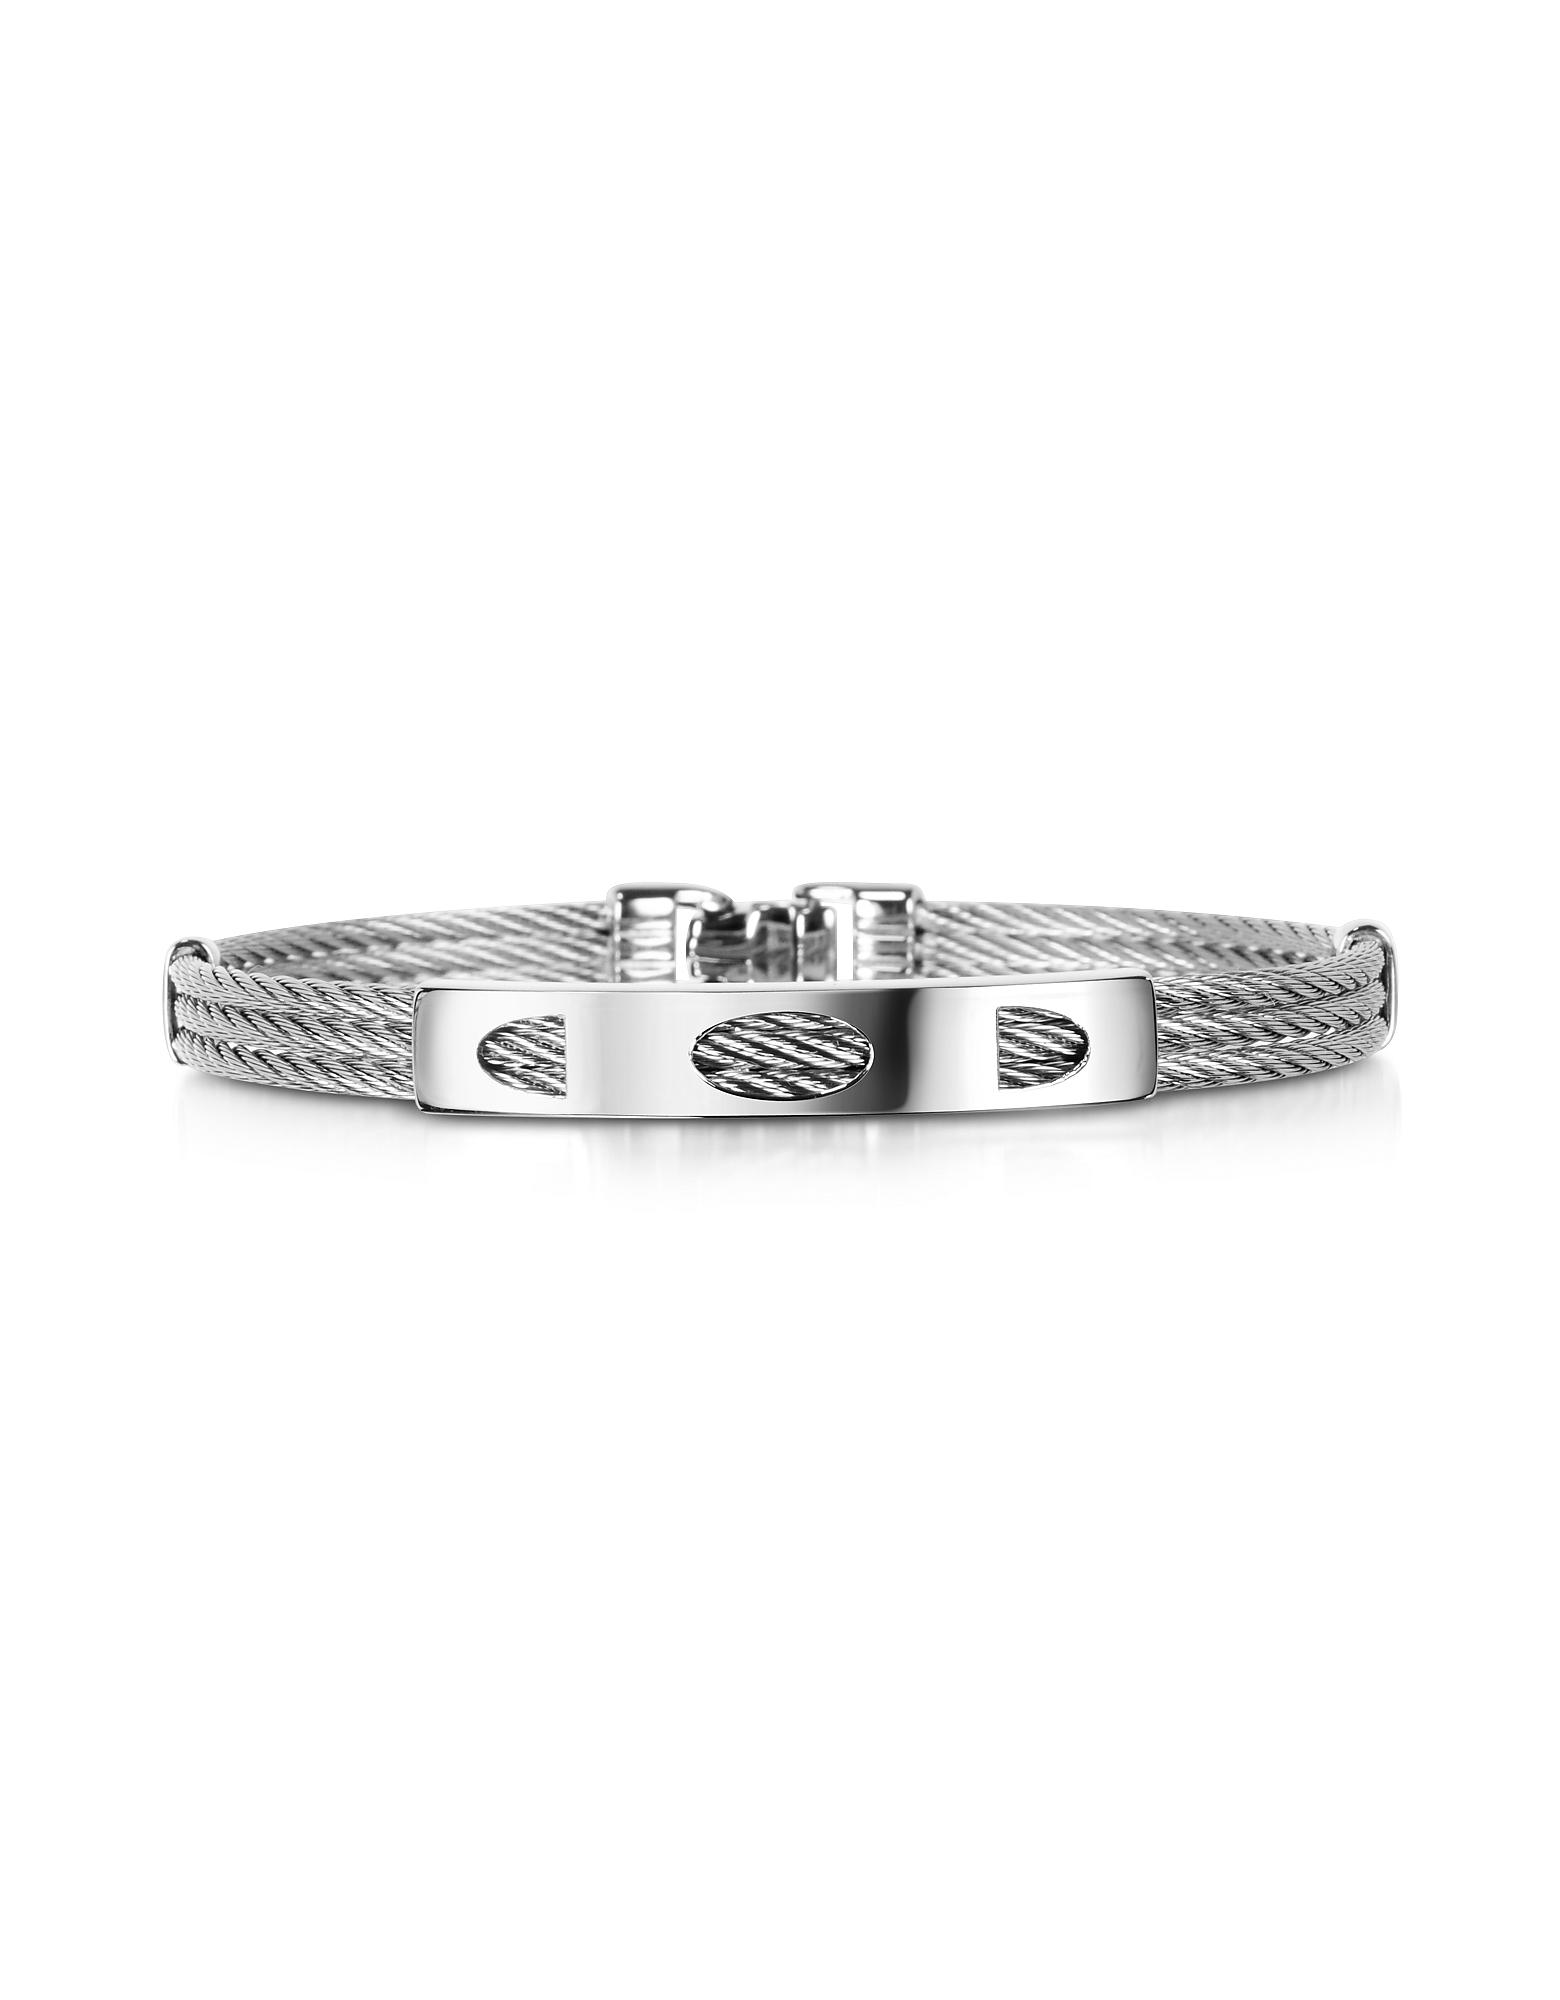 DiFulco Line Stainless Steel Three-Strand Bracelet